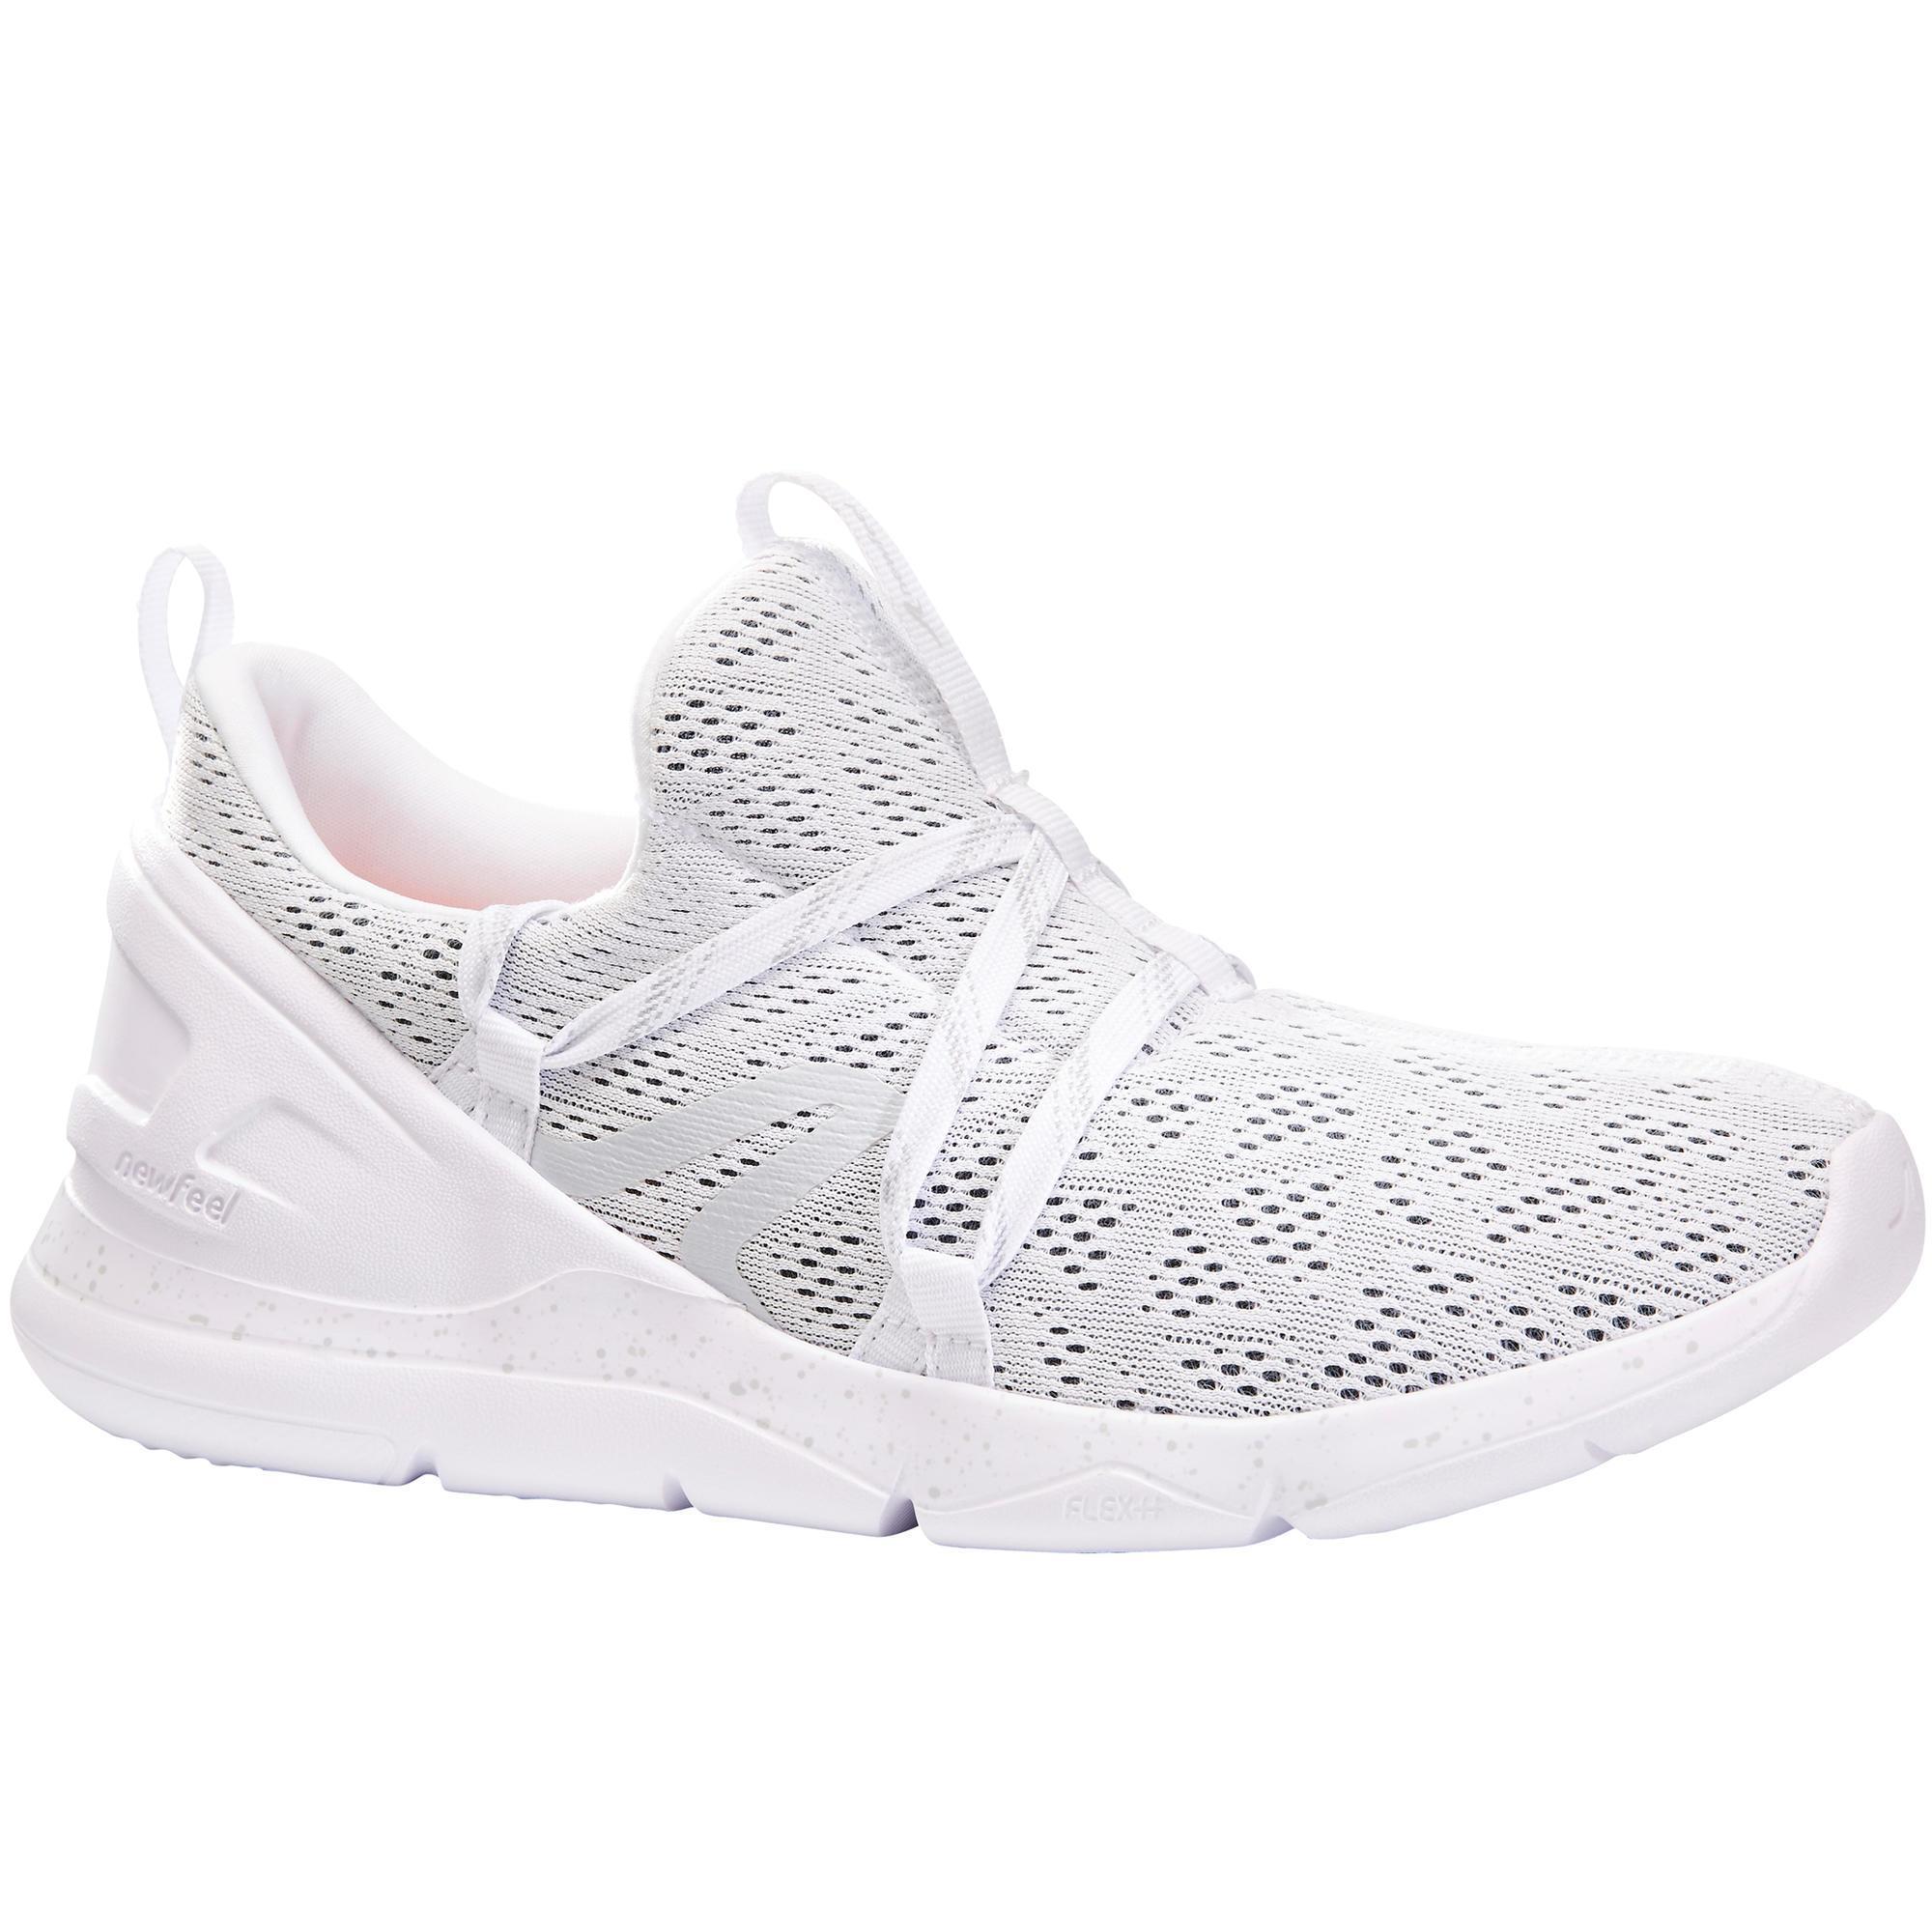 Newfeel Chaussures marche sportive femme PW 140 blanc - Newfeel